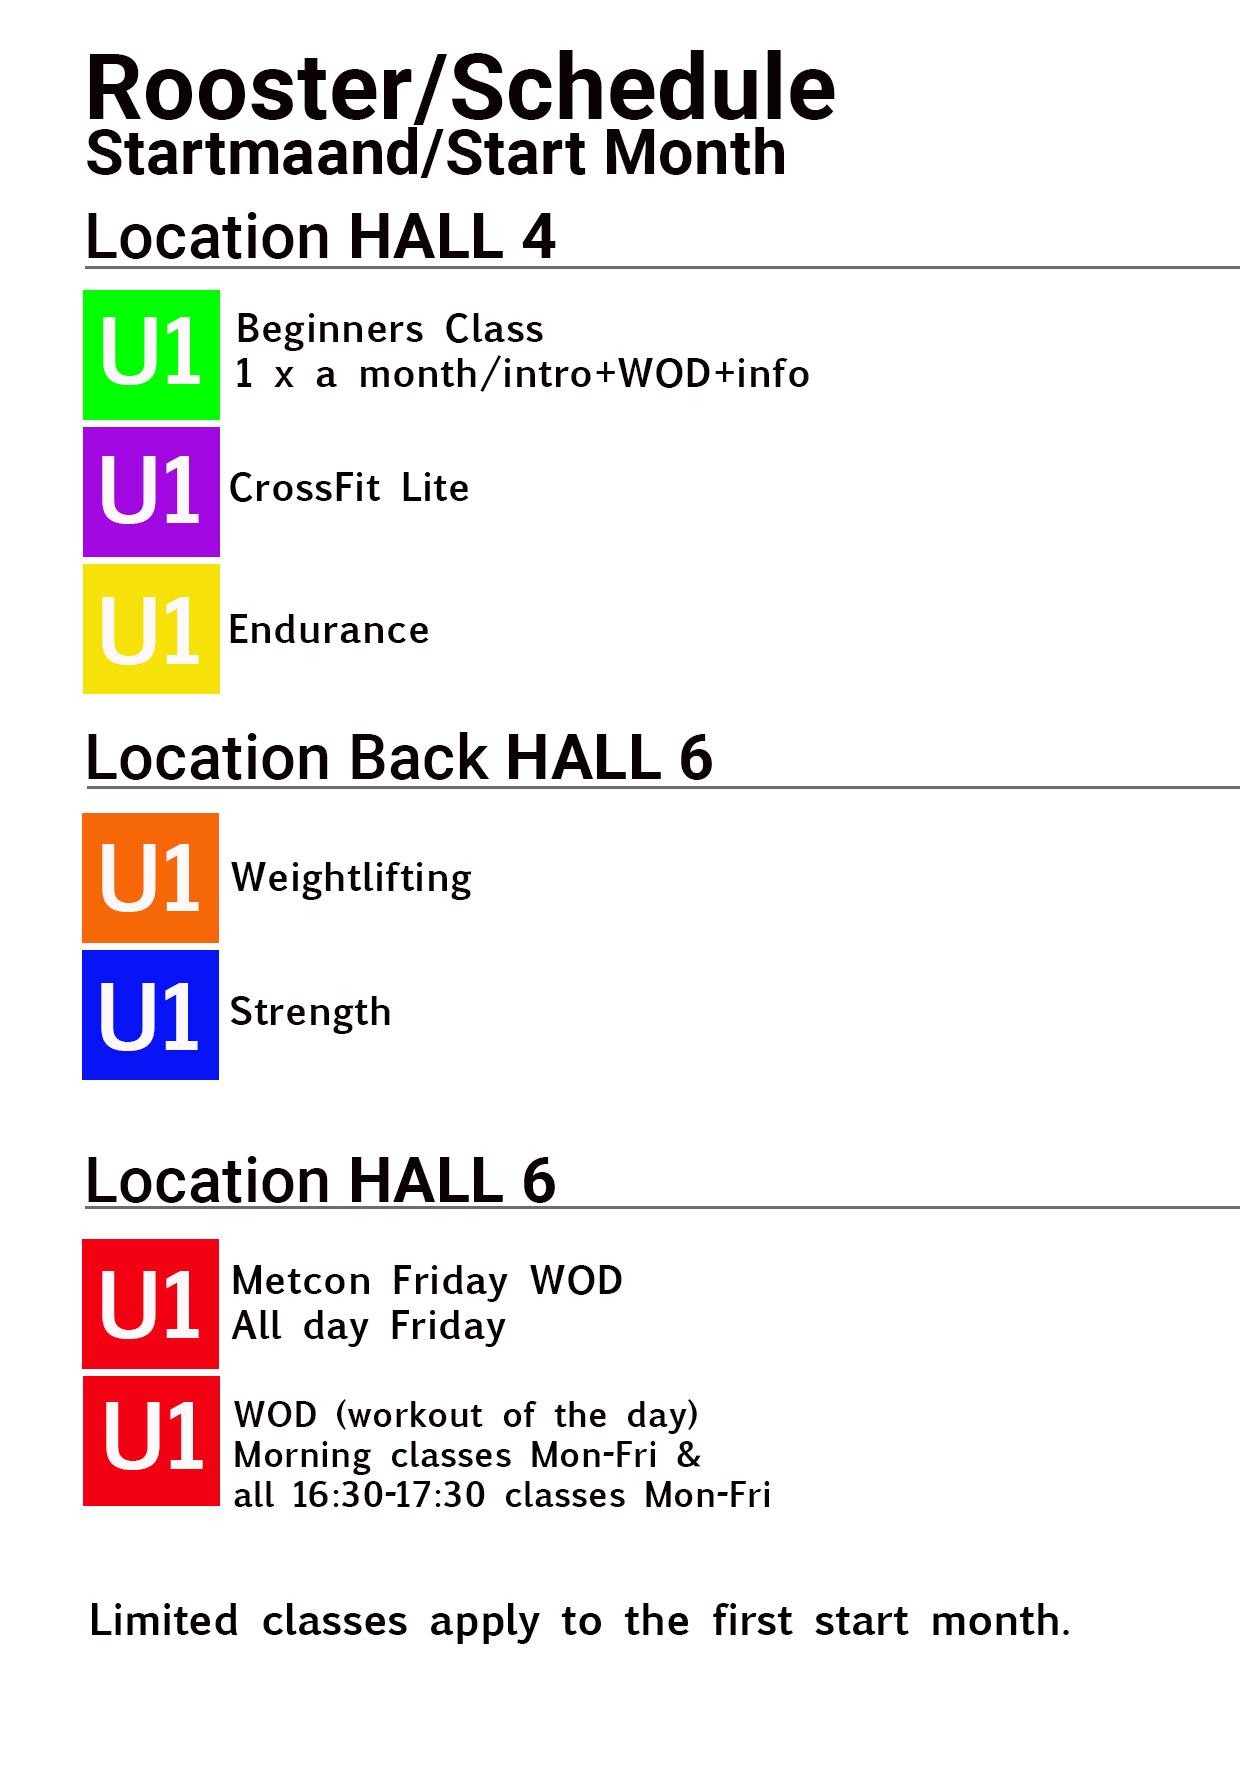 Getting Started with CrossFit @ U1 - Crossfit U1